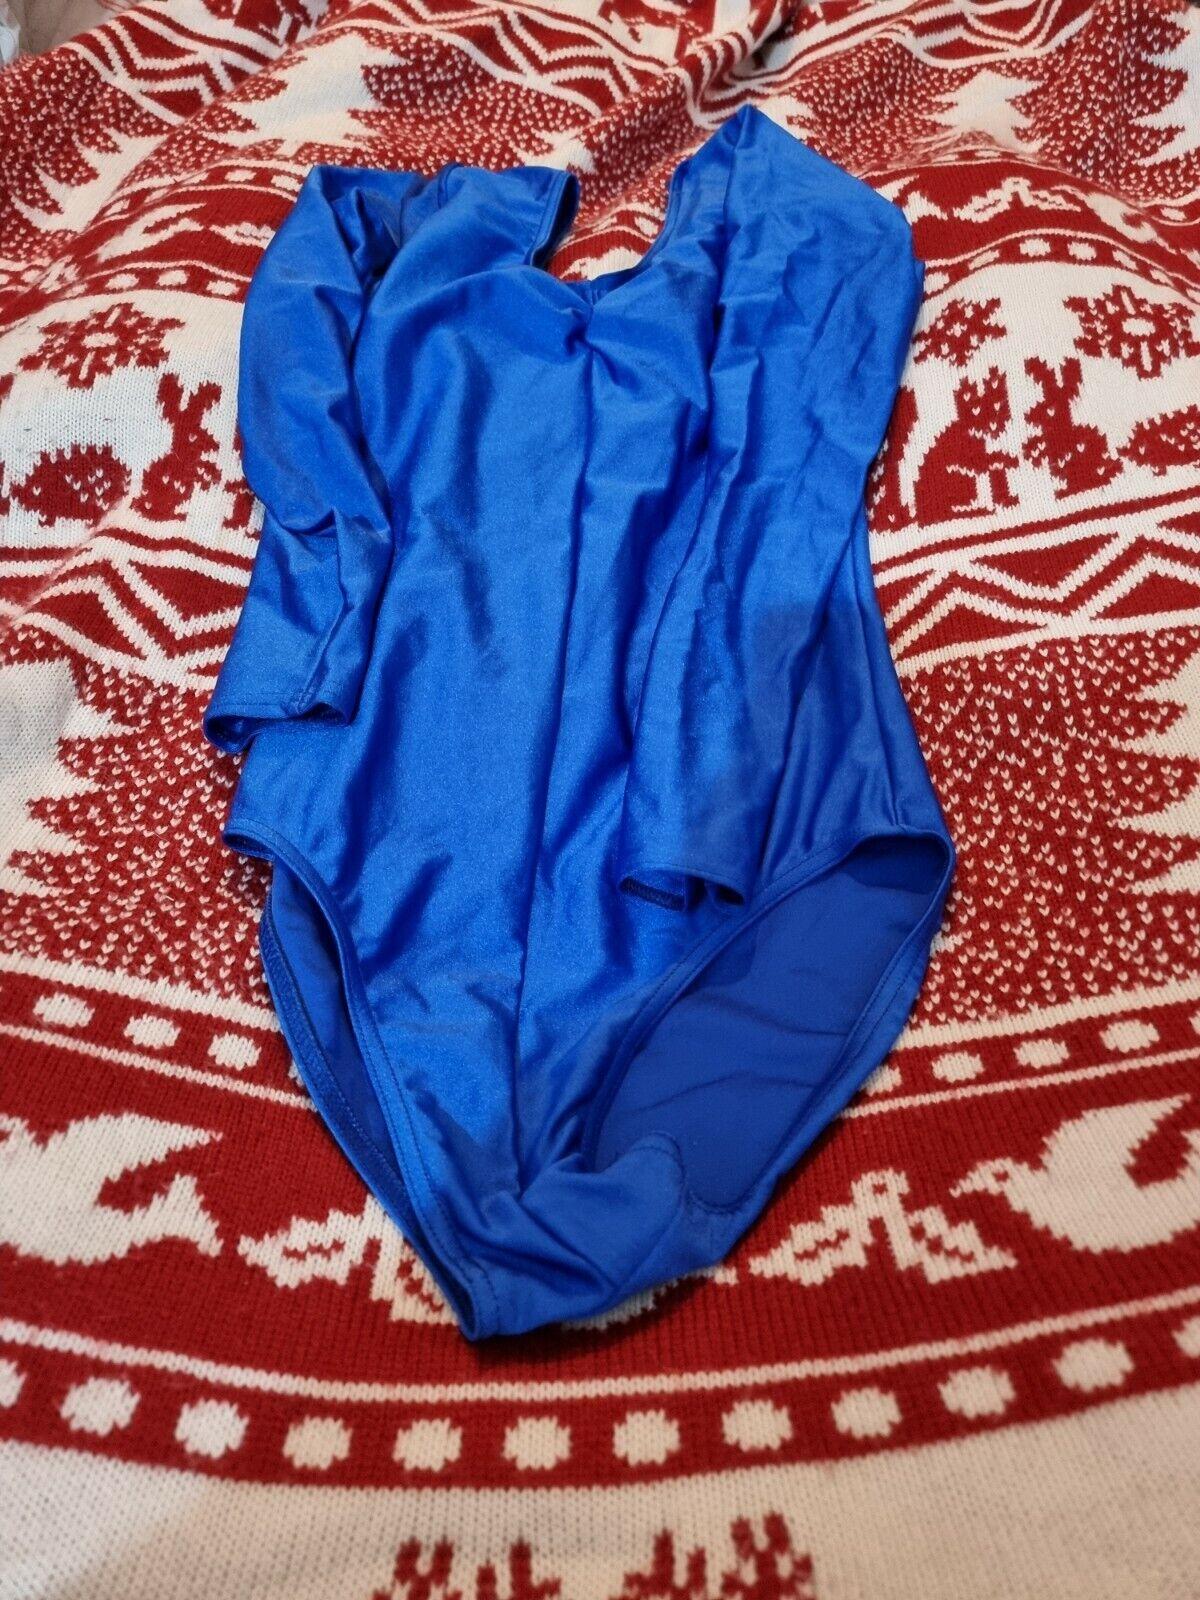 *Lovely Ladies Blue Katz Dance Leptard Size 3 Small*🙂